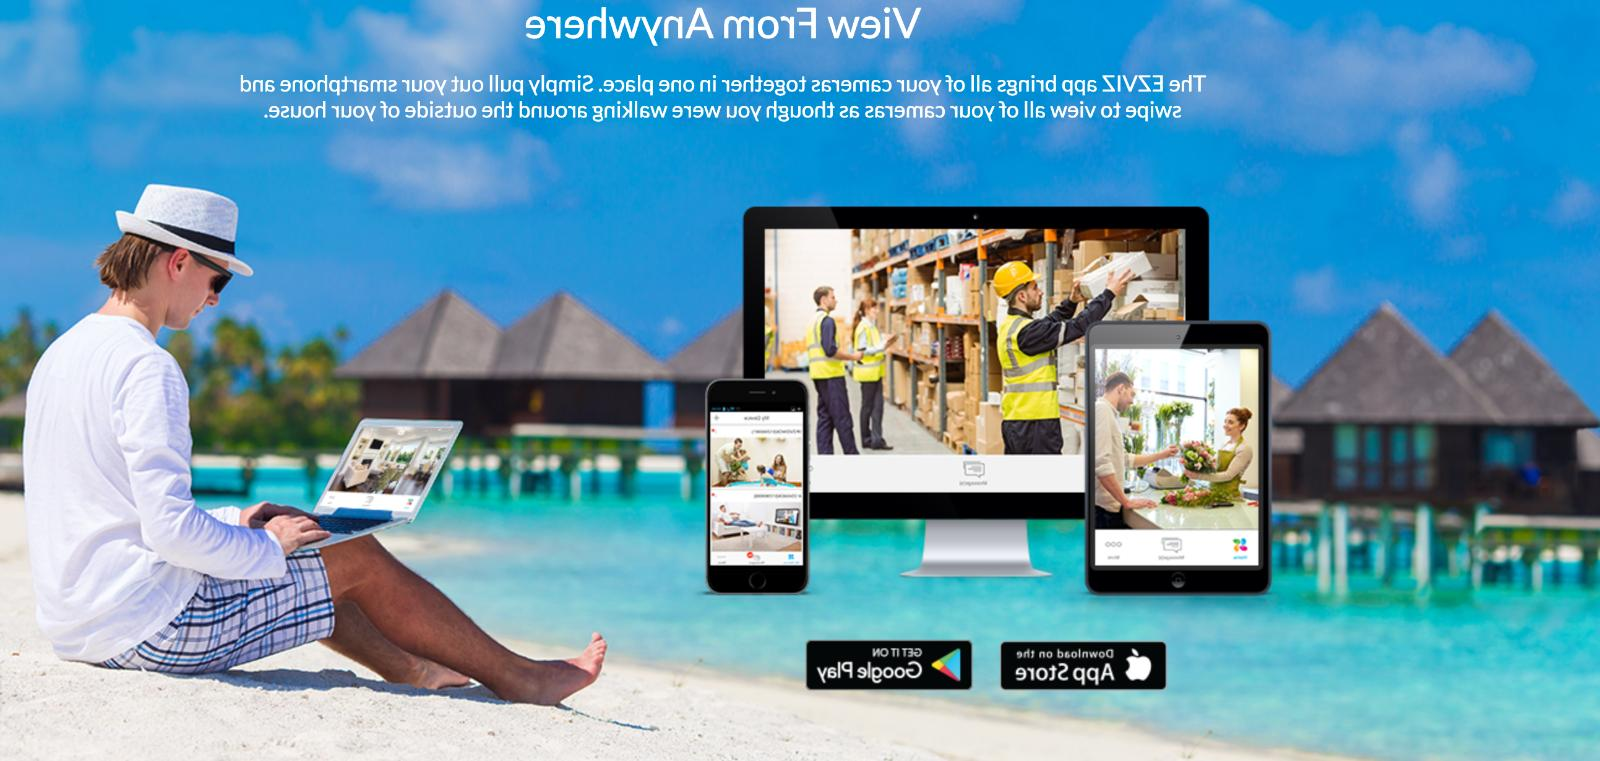 Ezviz 12 channel Surveillance System 2TB HDD